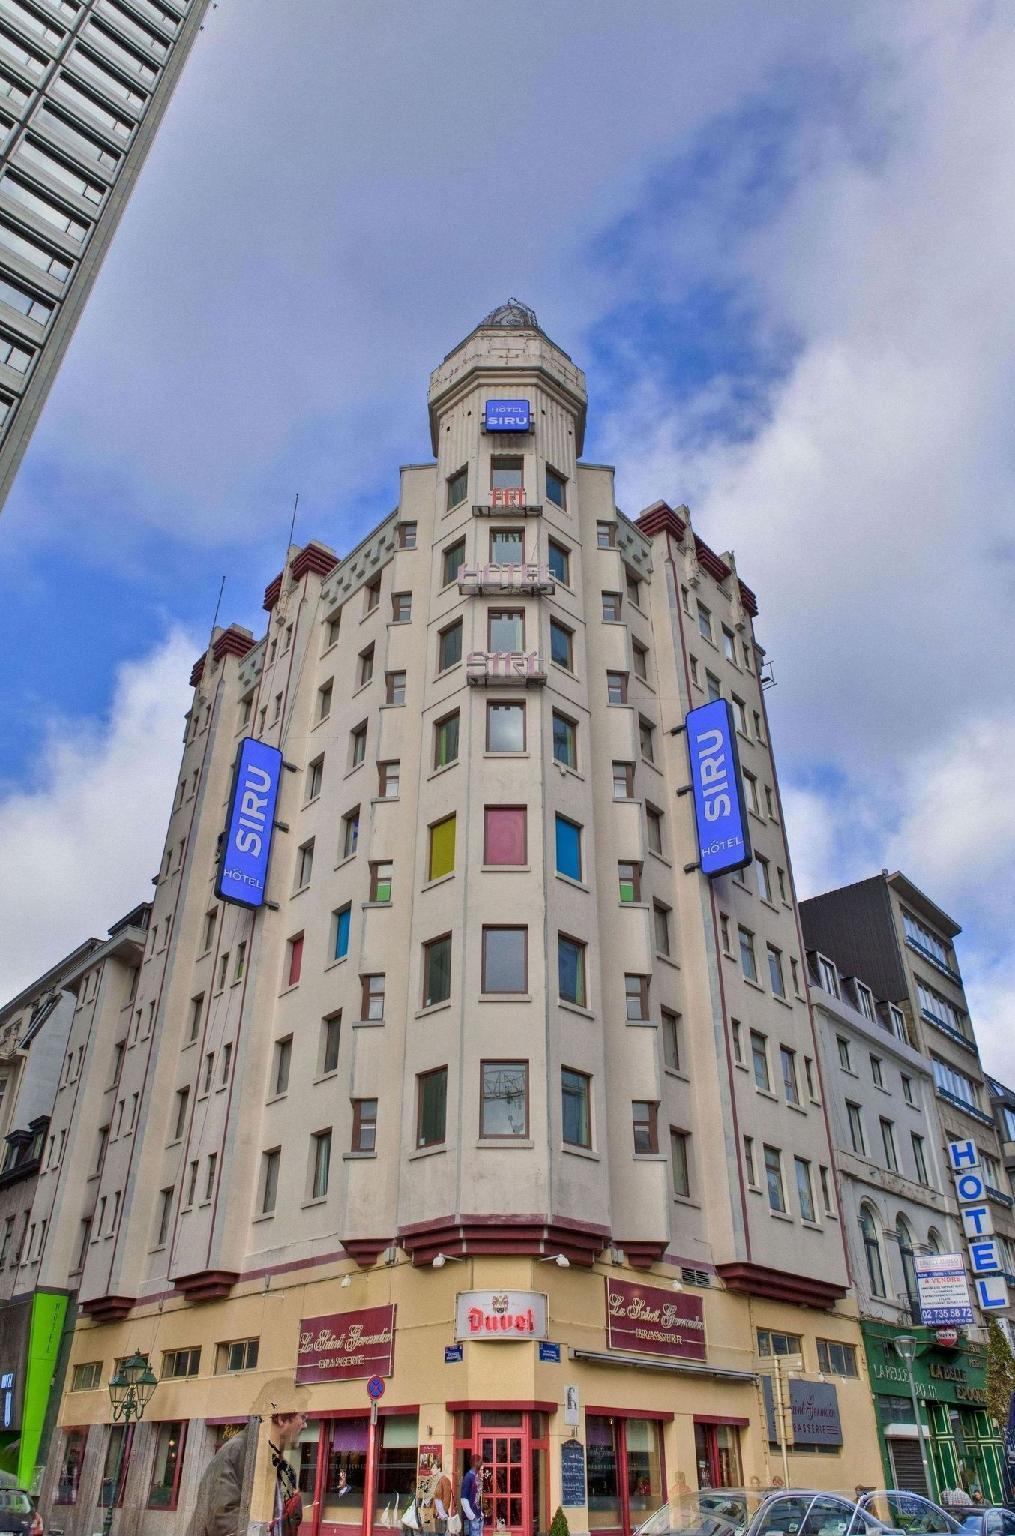 Hotel Siru, Bruxelles